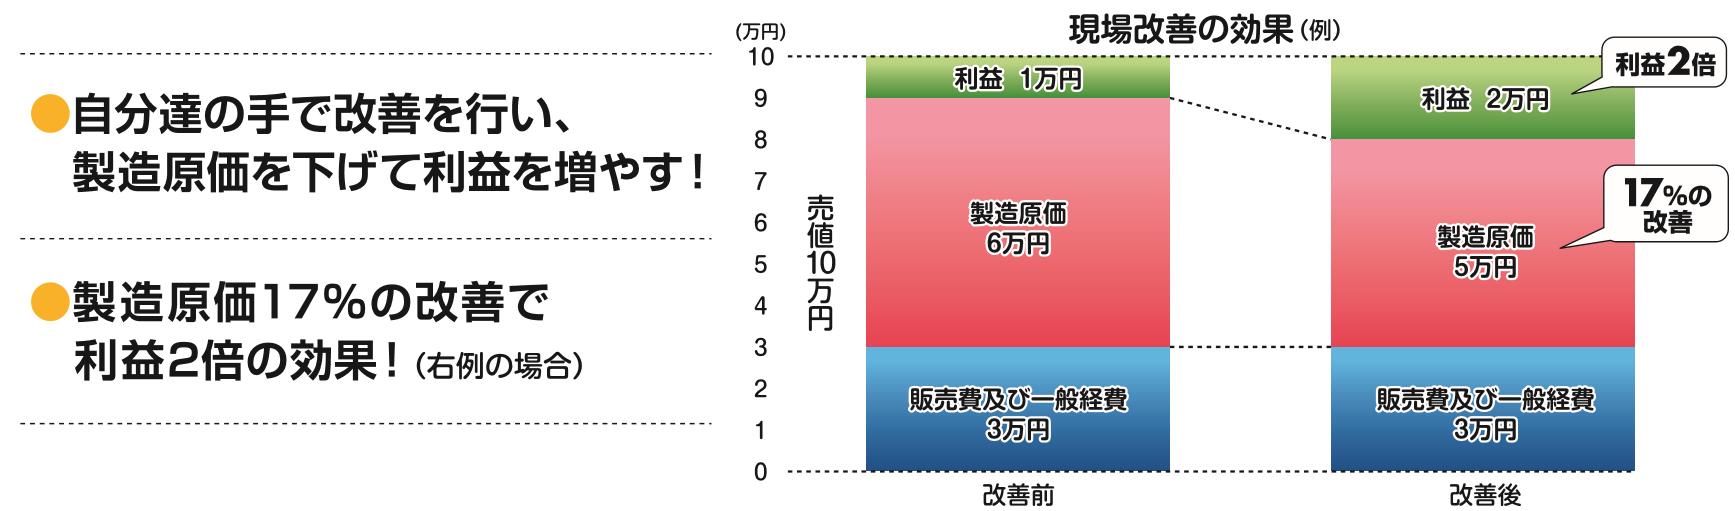 jinzai_images_ikuseizyuku_genbakaizenkouka